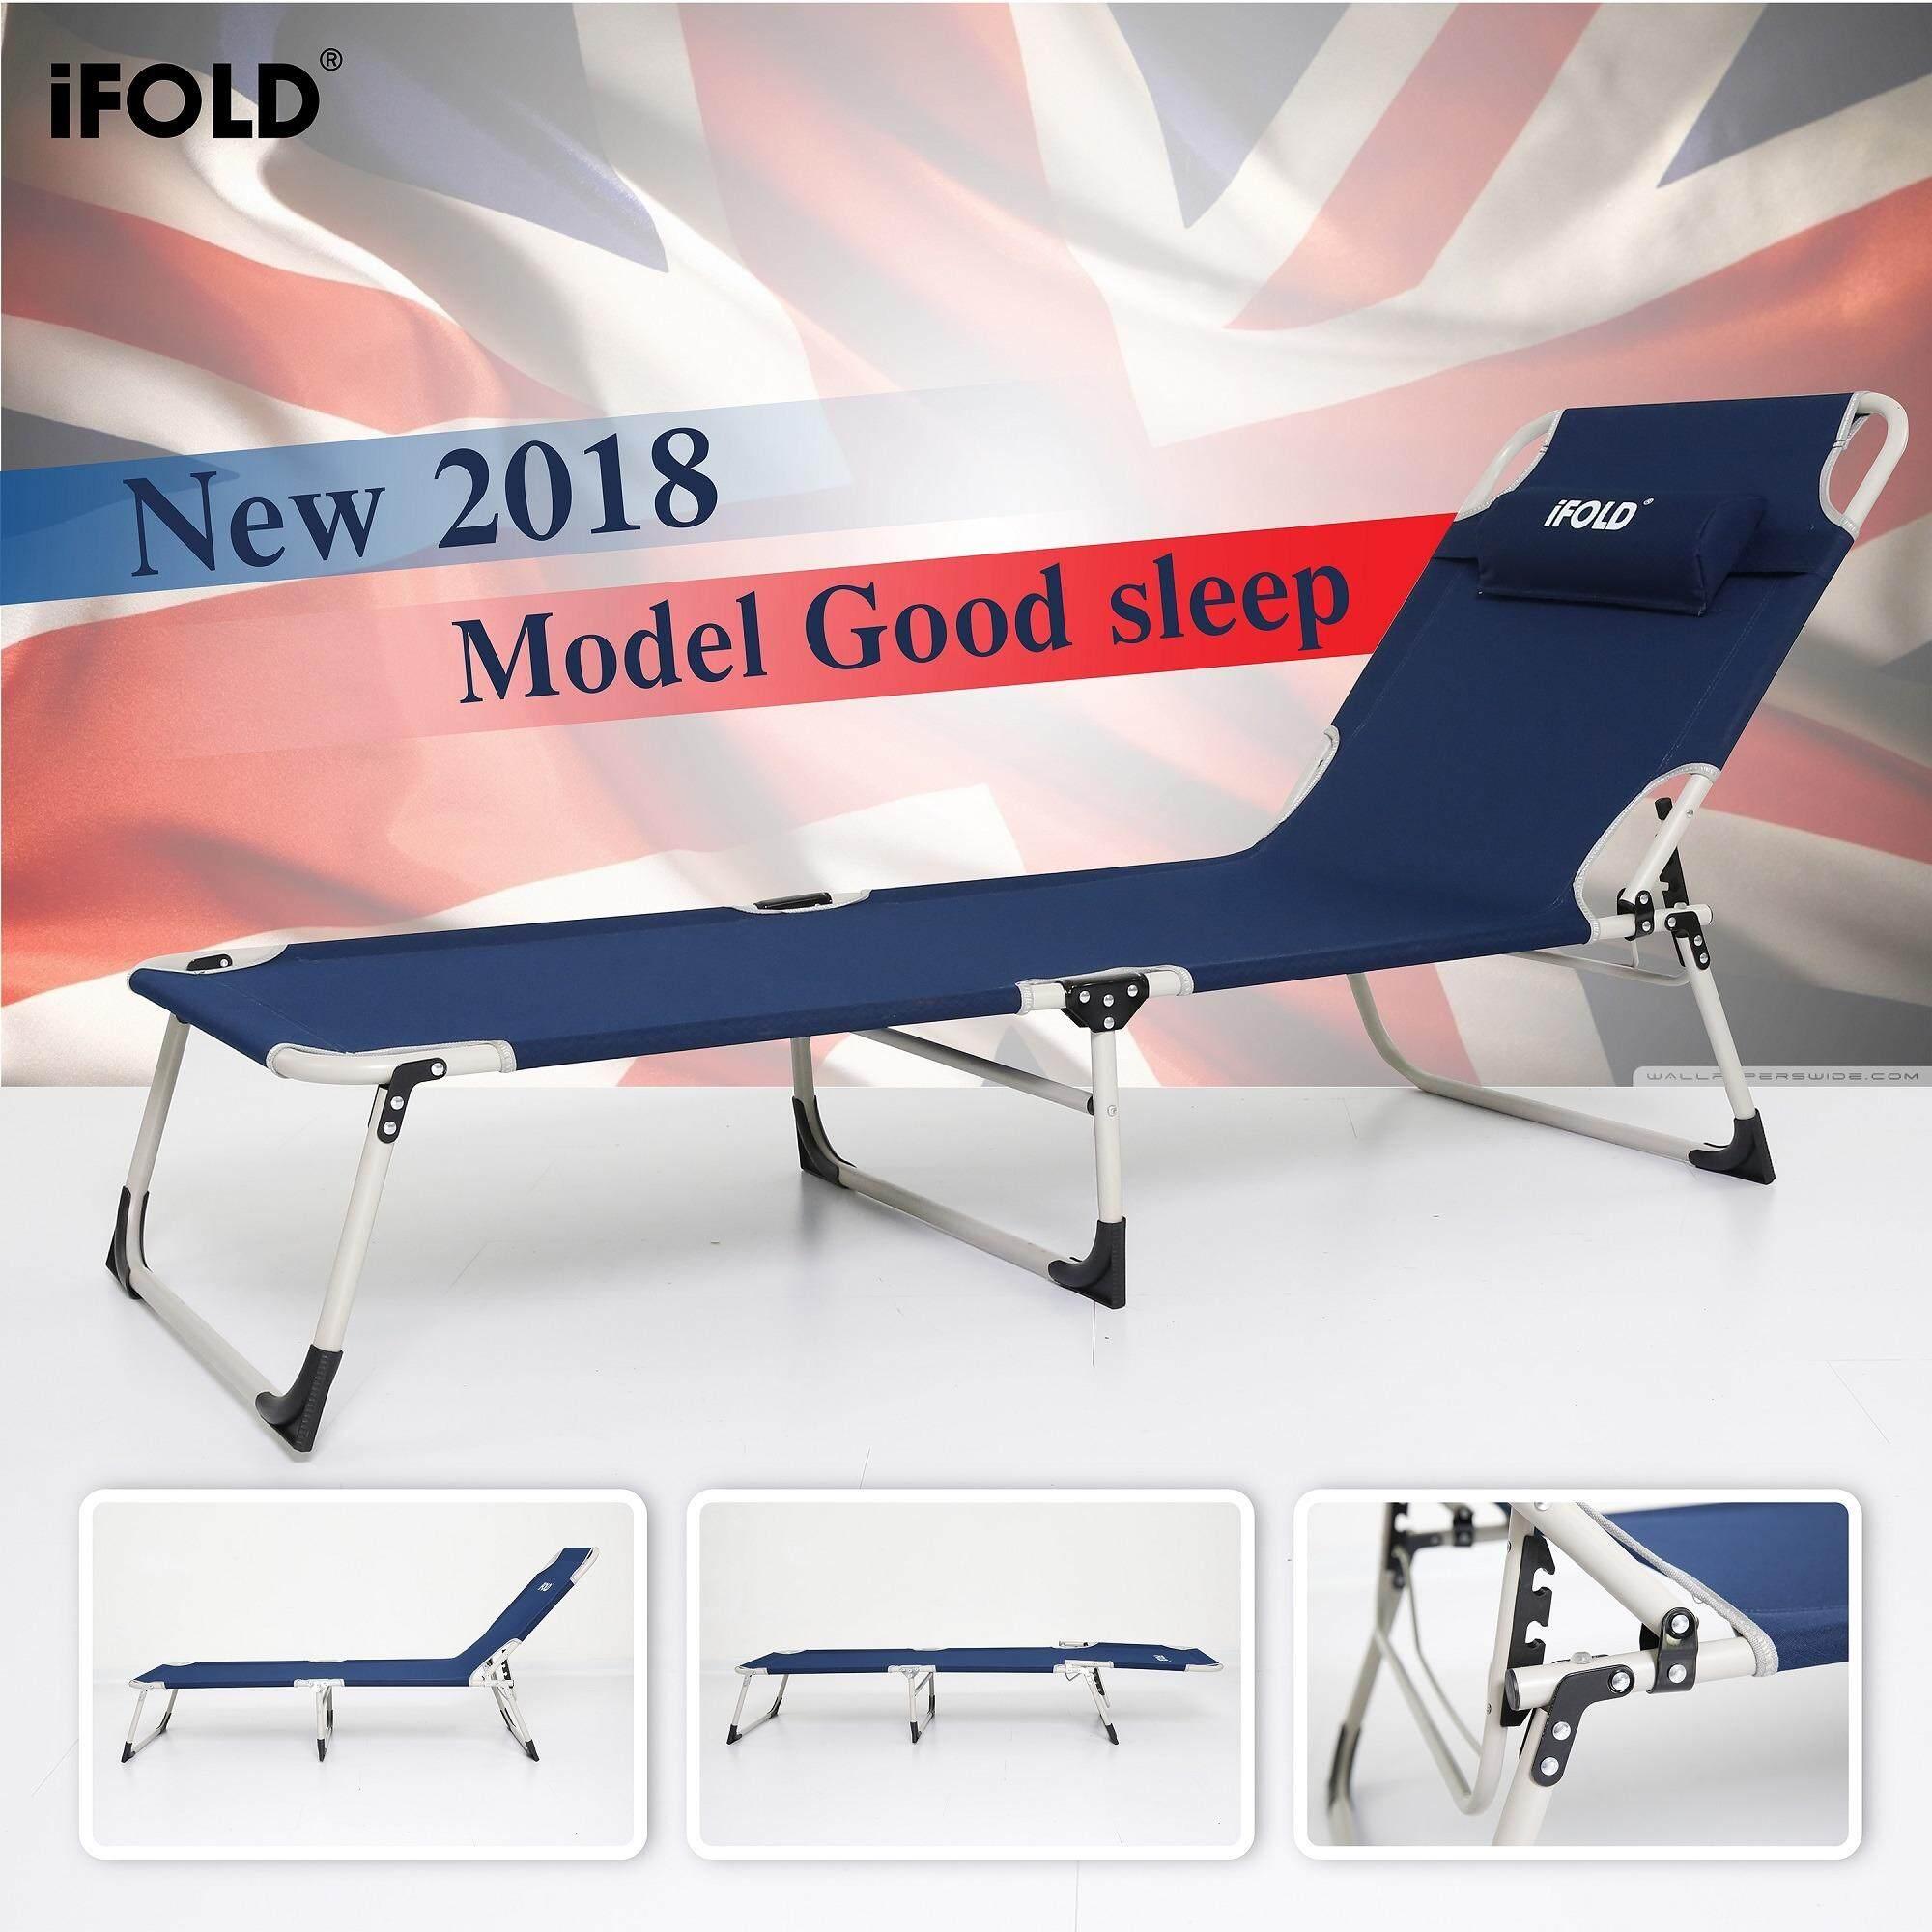 Ifold 3 Legs Blue เตียงสนามแบบพับได้ สีน้ำเงิน เป็นต้นฉบับ